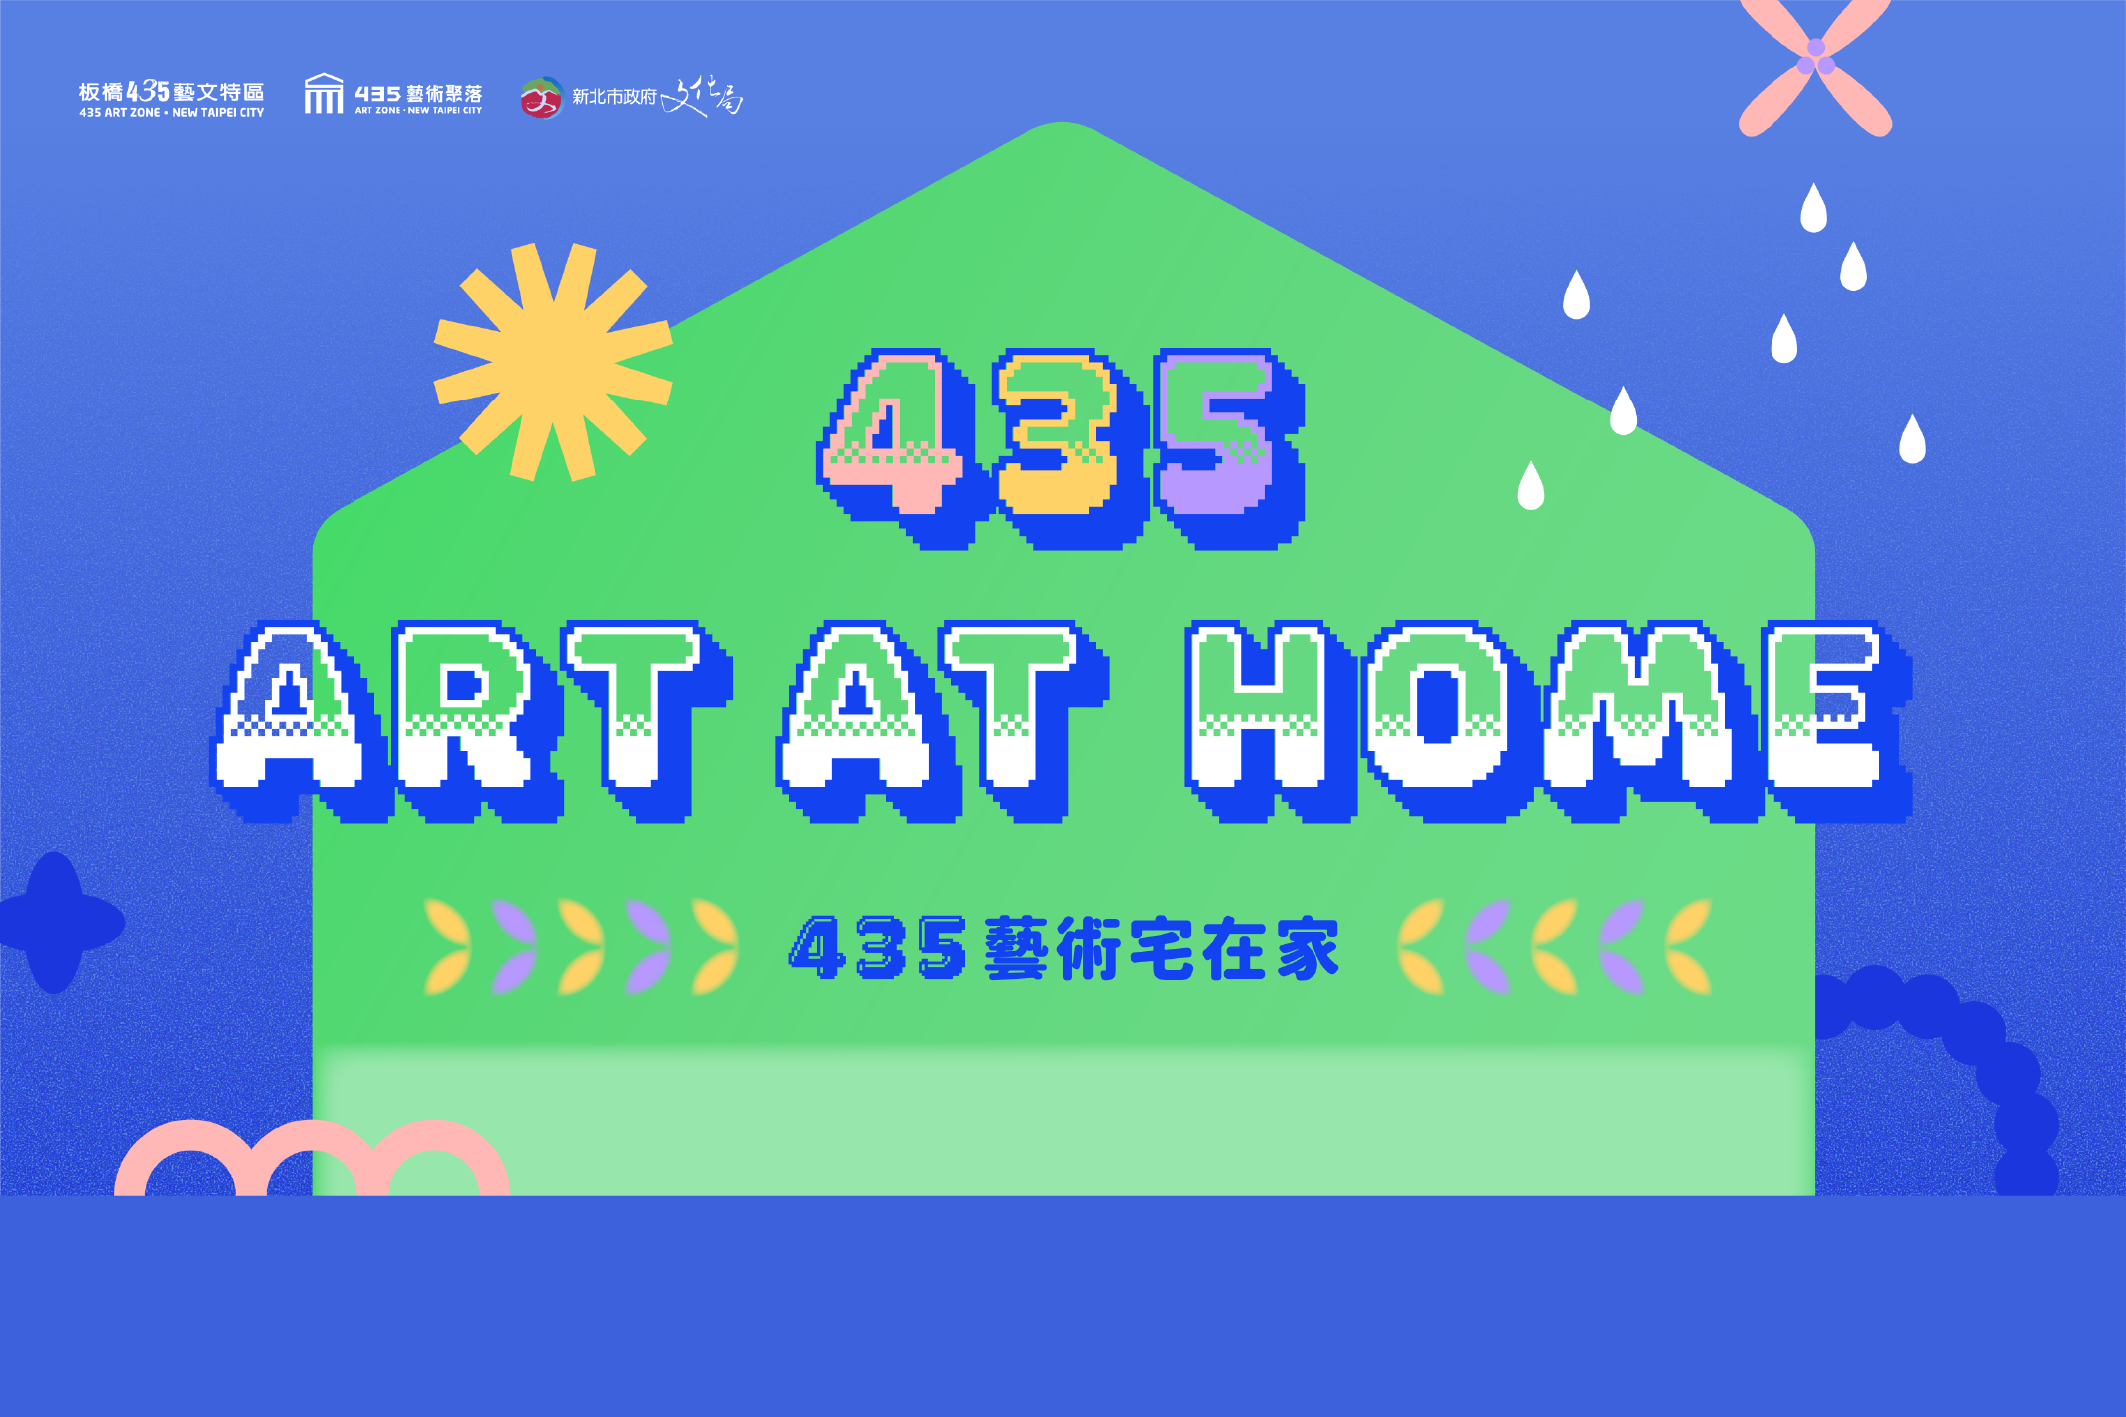 《435 ART AT HOME 》  110年課程節目單